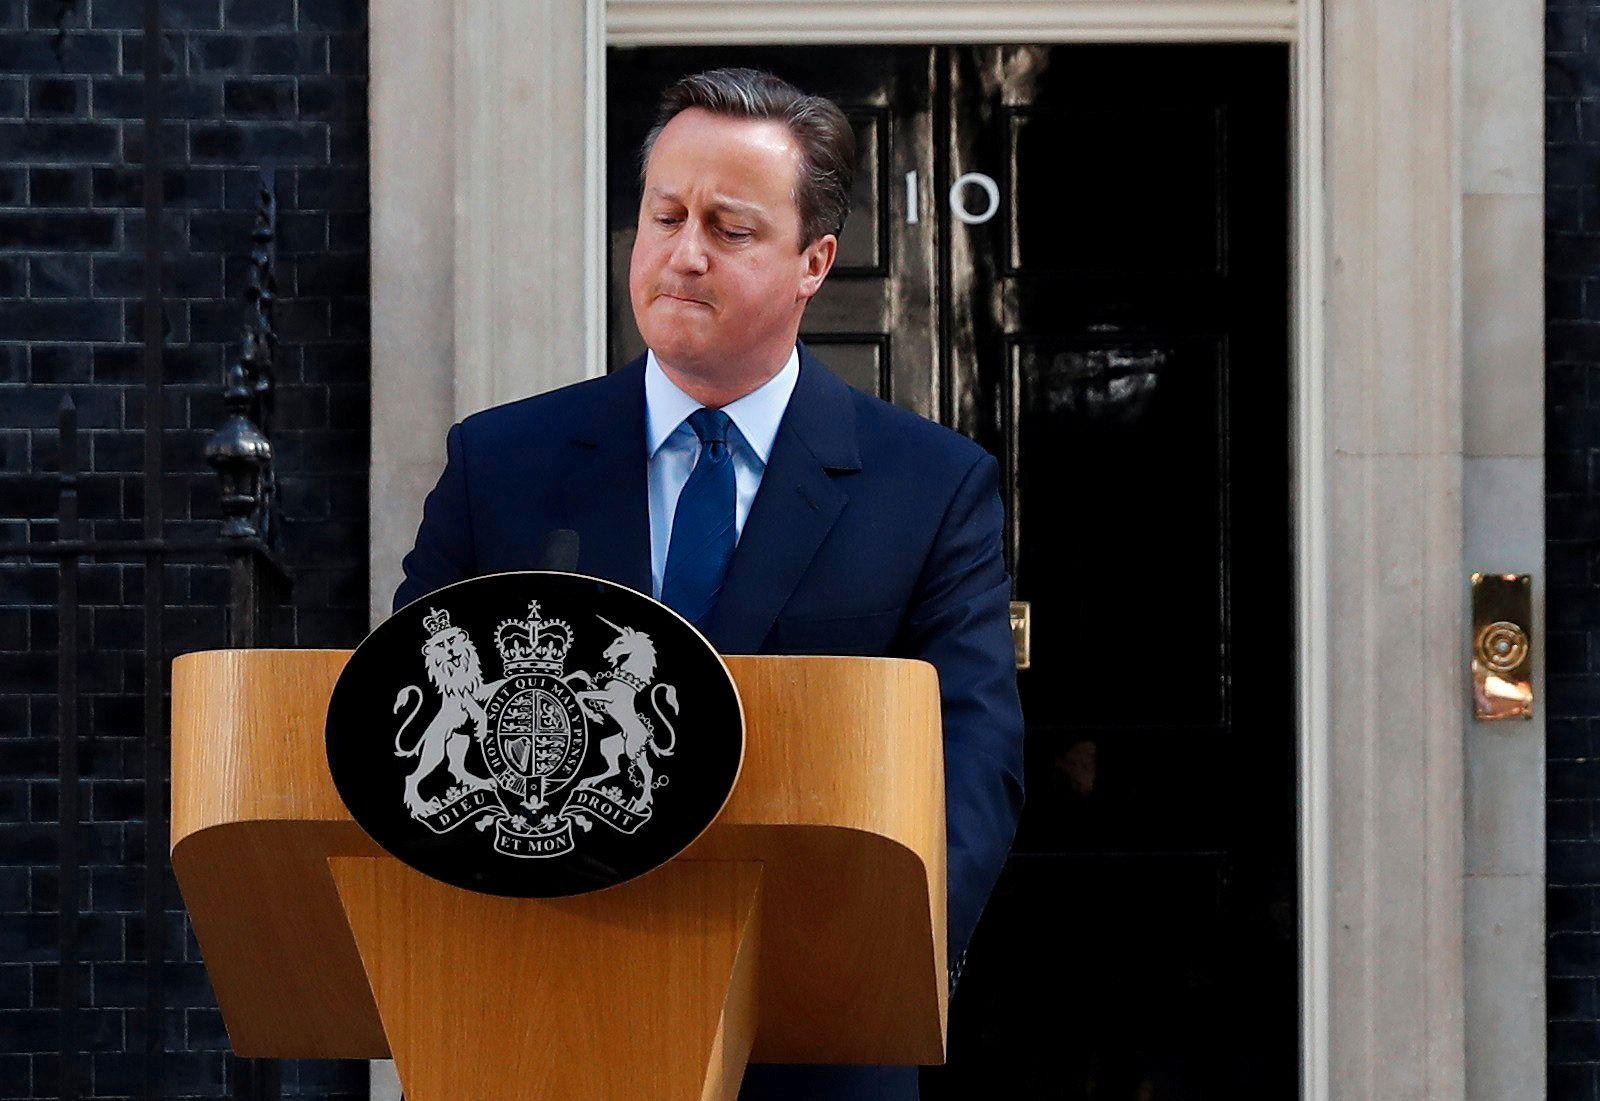 GAME OVER: David Camerons ettermæle ble over natten endret fra reformatoren som tok de konservative inn i en ny æra, til statsministeren som satte landets økonomi og EU i spill.